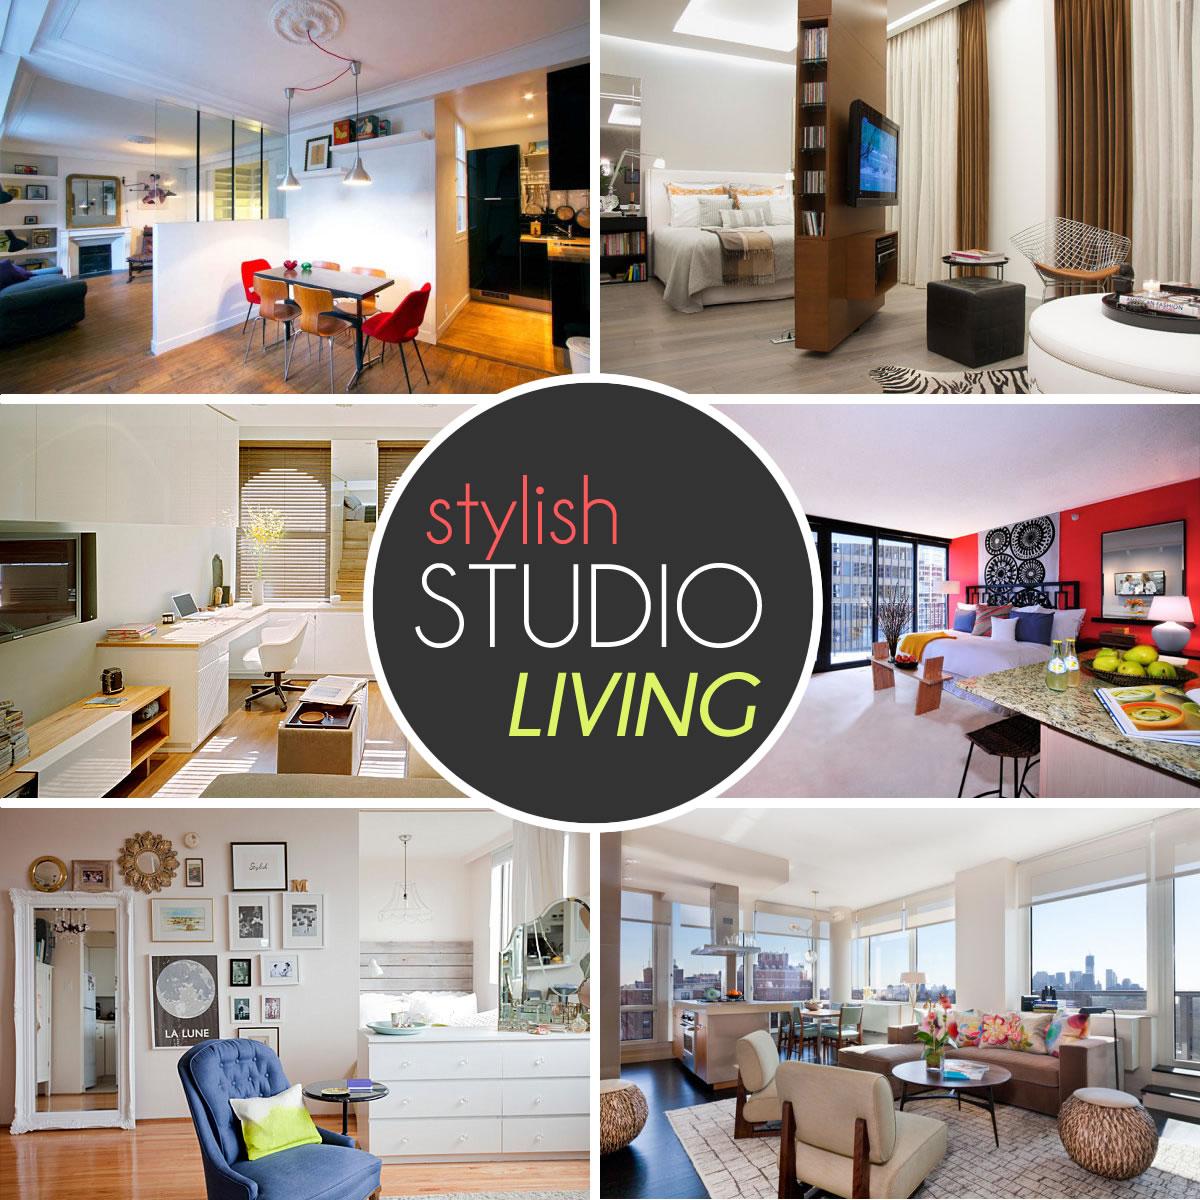 stylish studio living ideas